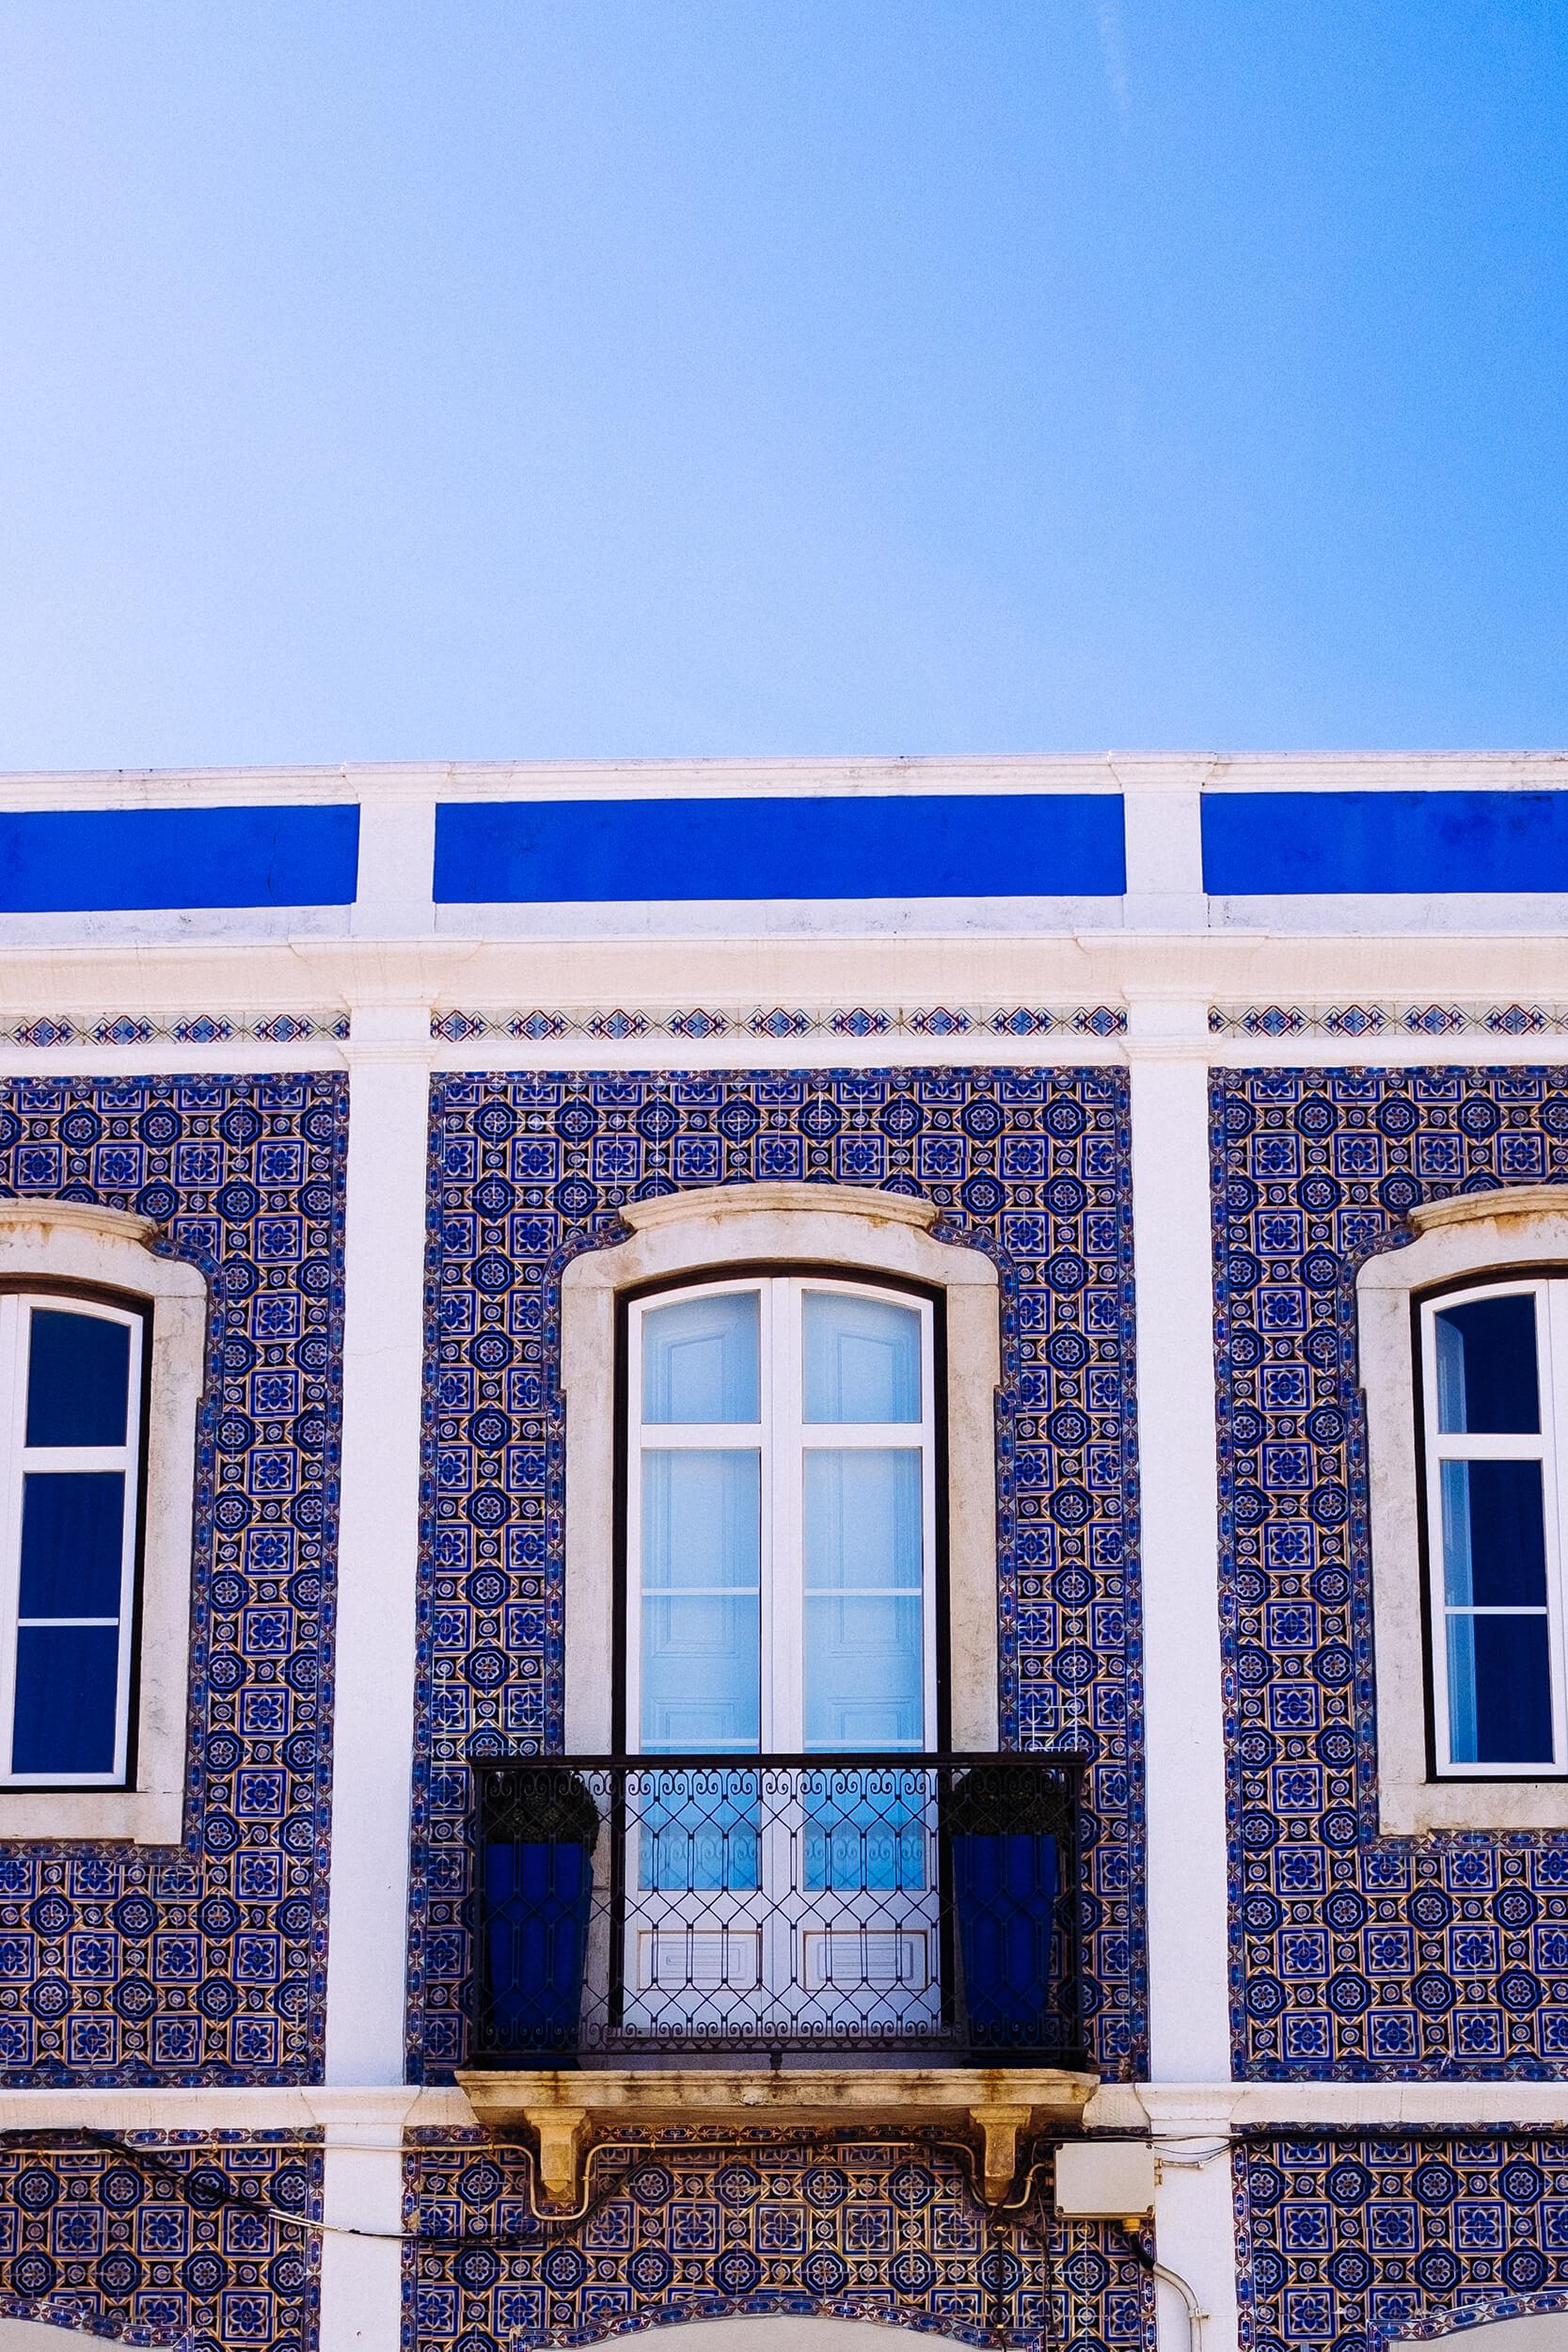 strangers-windows-algarve-portugal.jpg